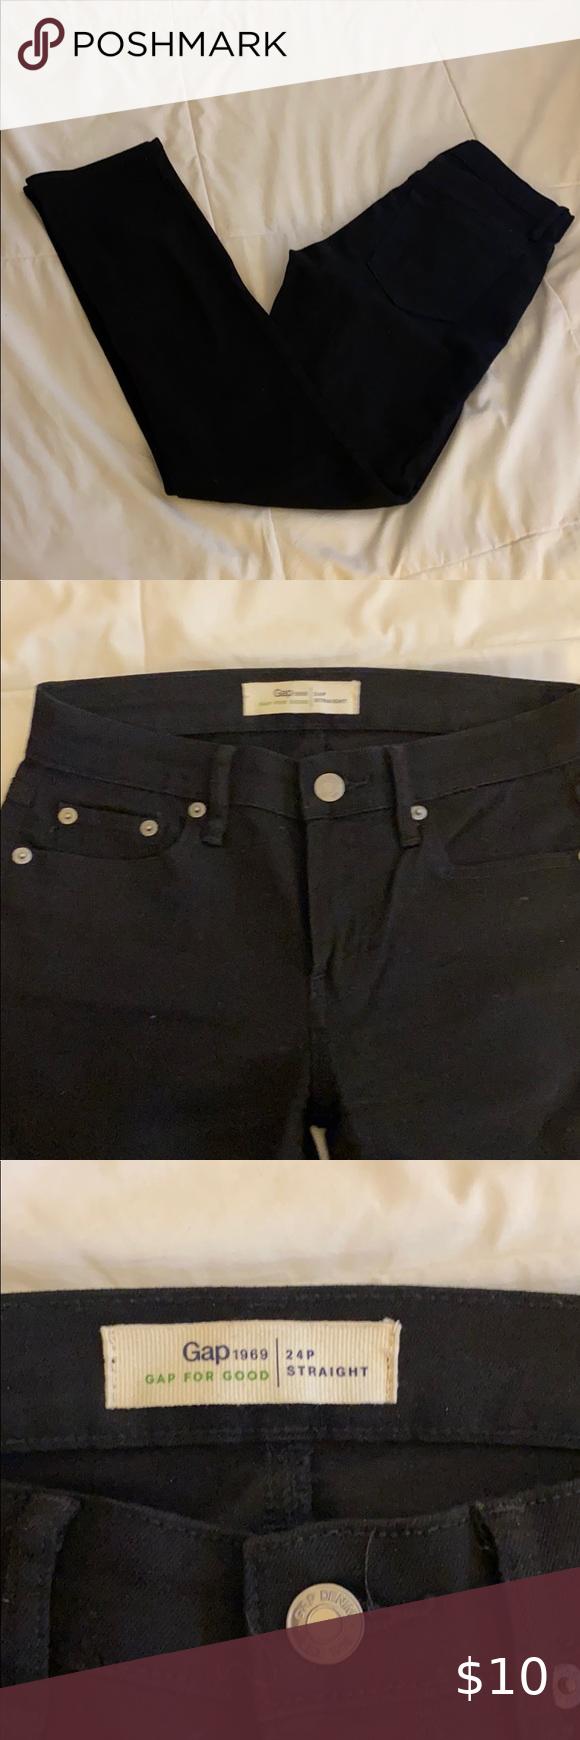 NWOT GAP STRAIGHT LEG JEANS   Straight leg jeans, Clothes